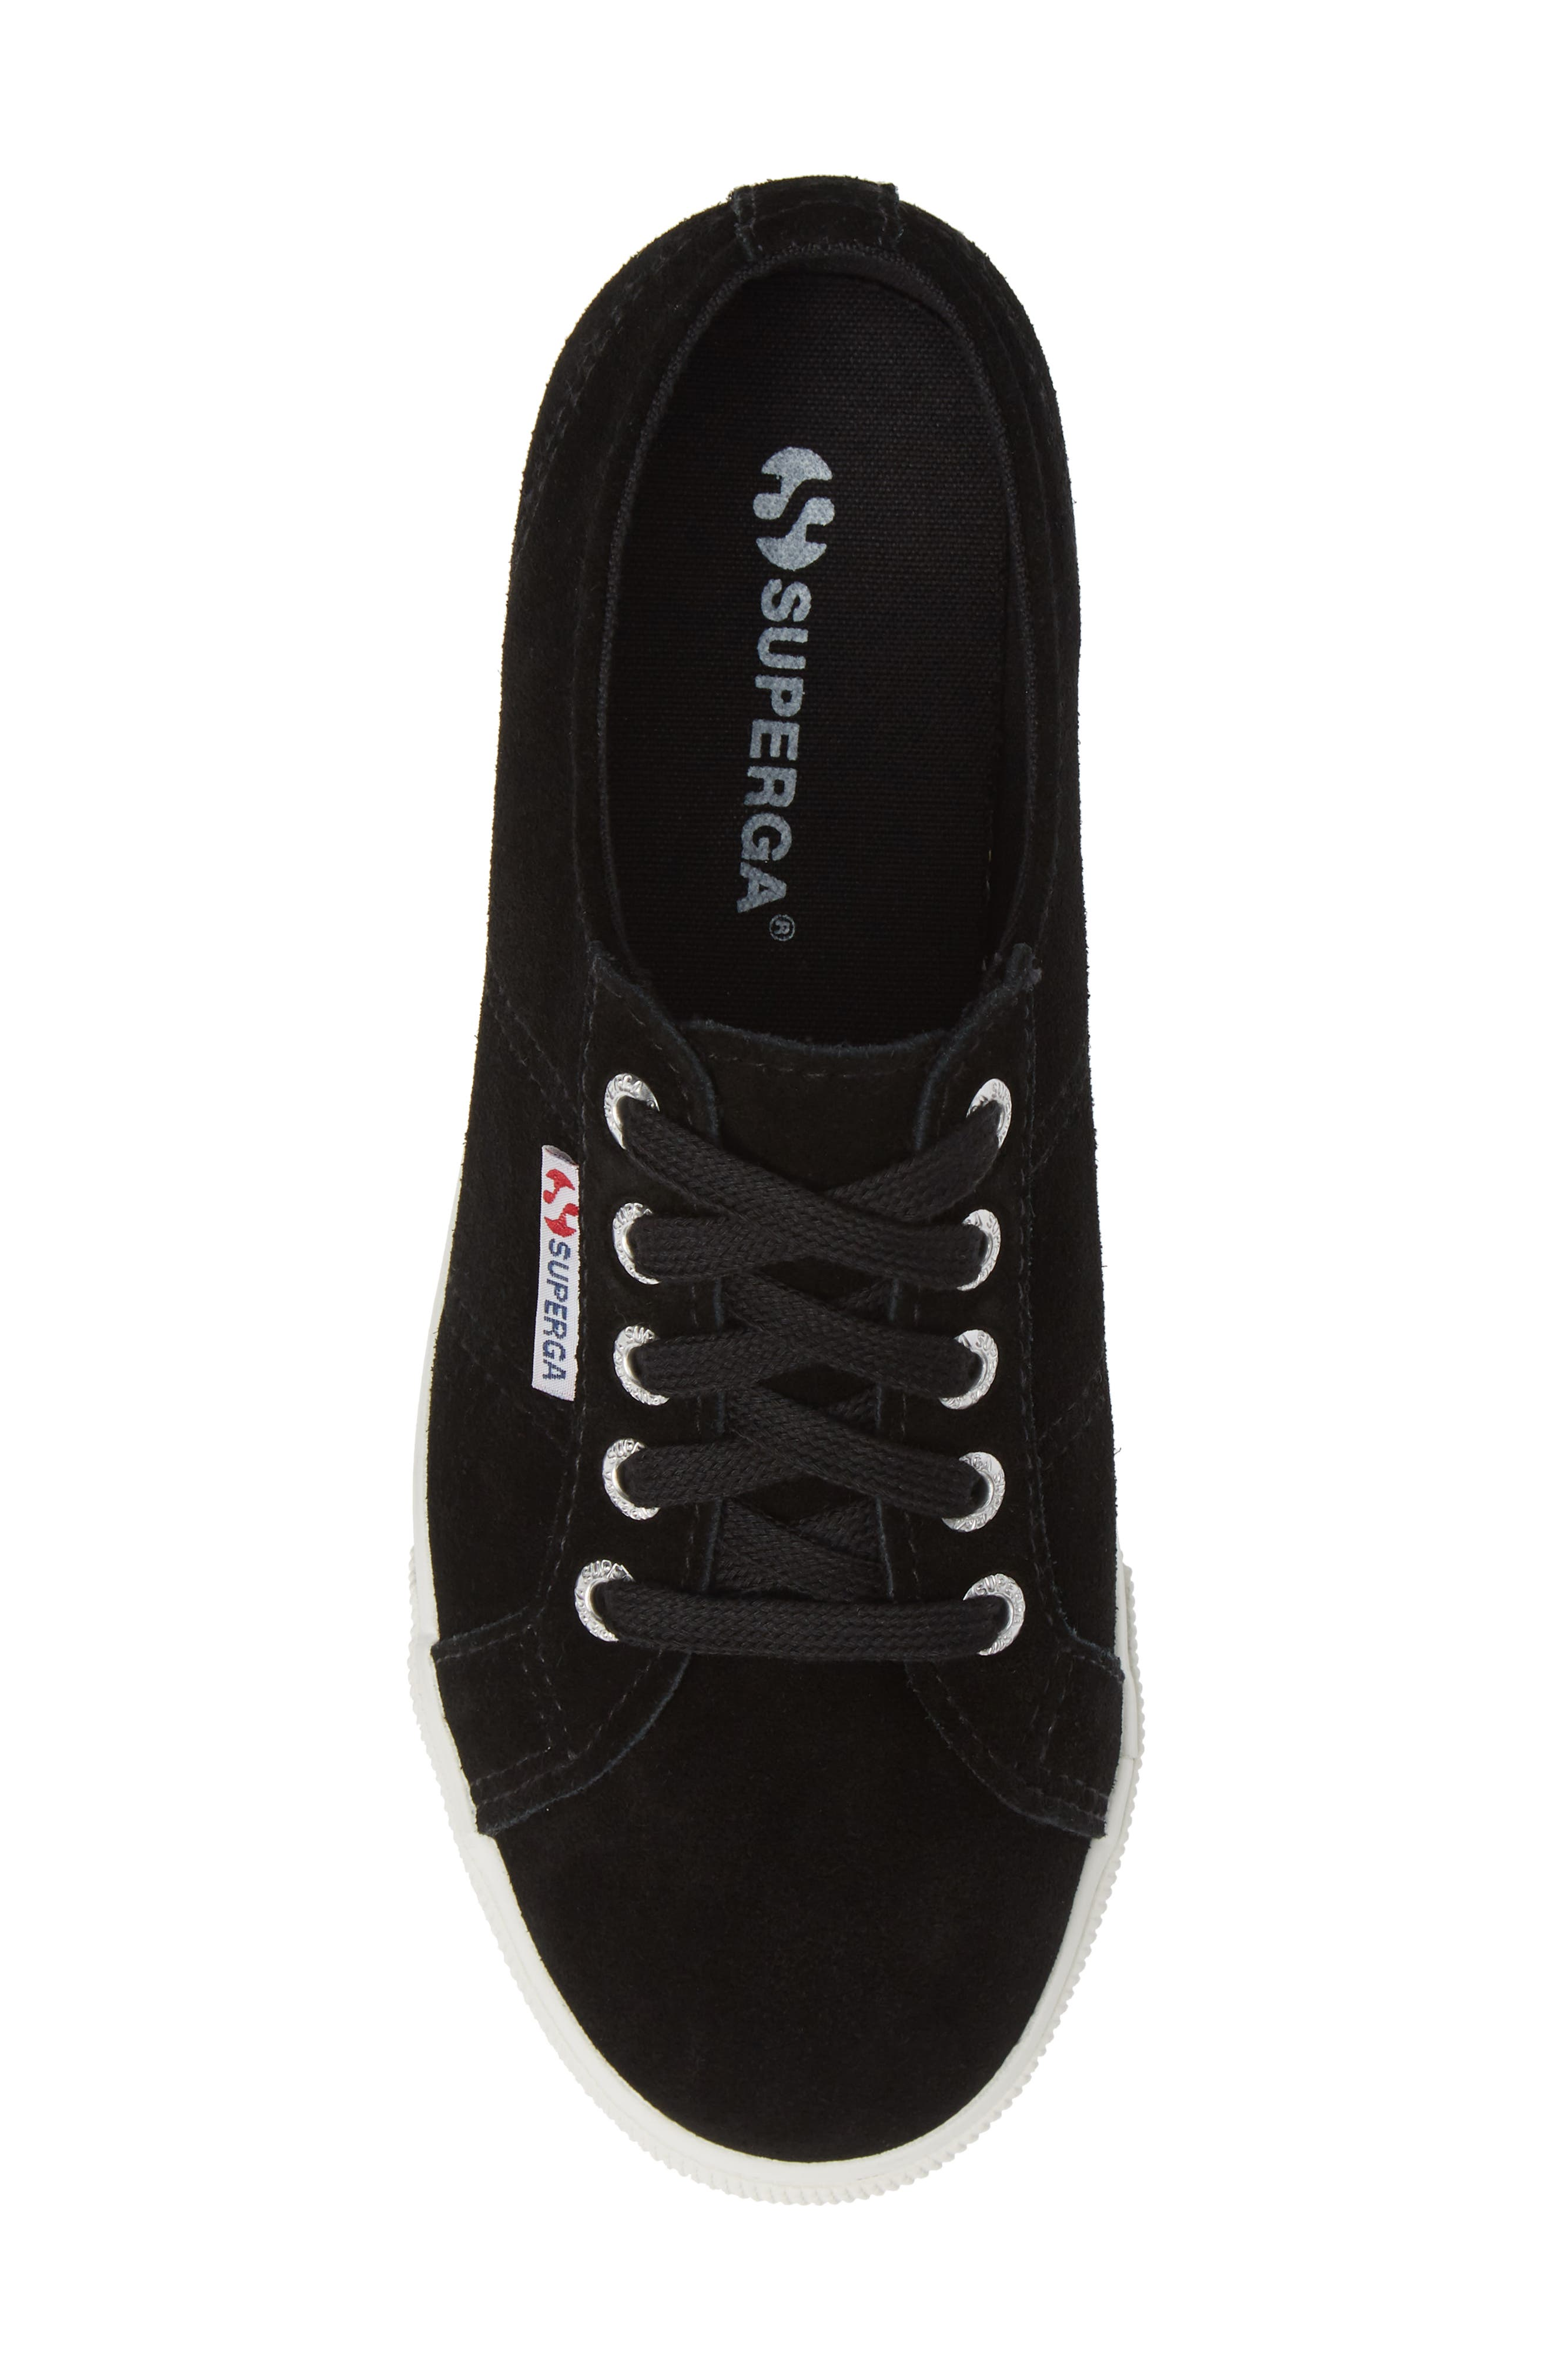 2790 Platform Sneaker,                             Alternate thumbnail 5, color,                             006